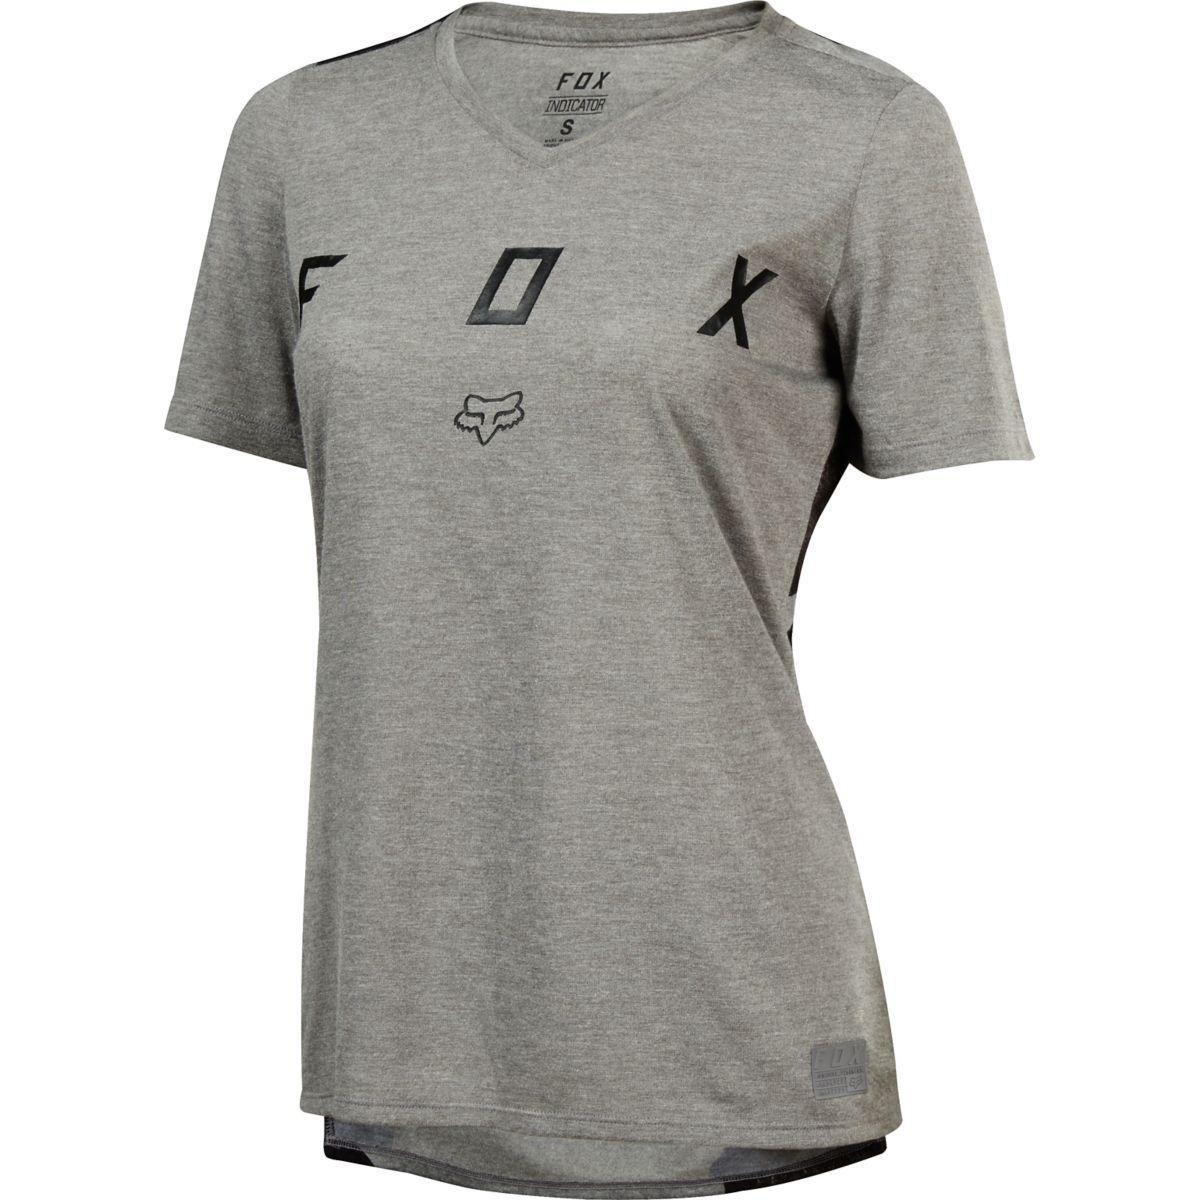 Amazon.com   Fox Racing Womens Indicator Short Sleeve Jersey - 18483-040    Sports   Outdoors a7022b635